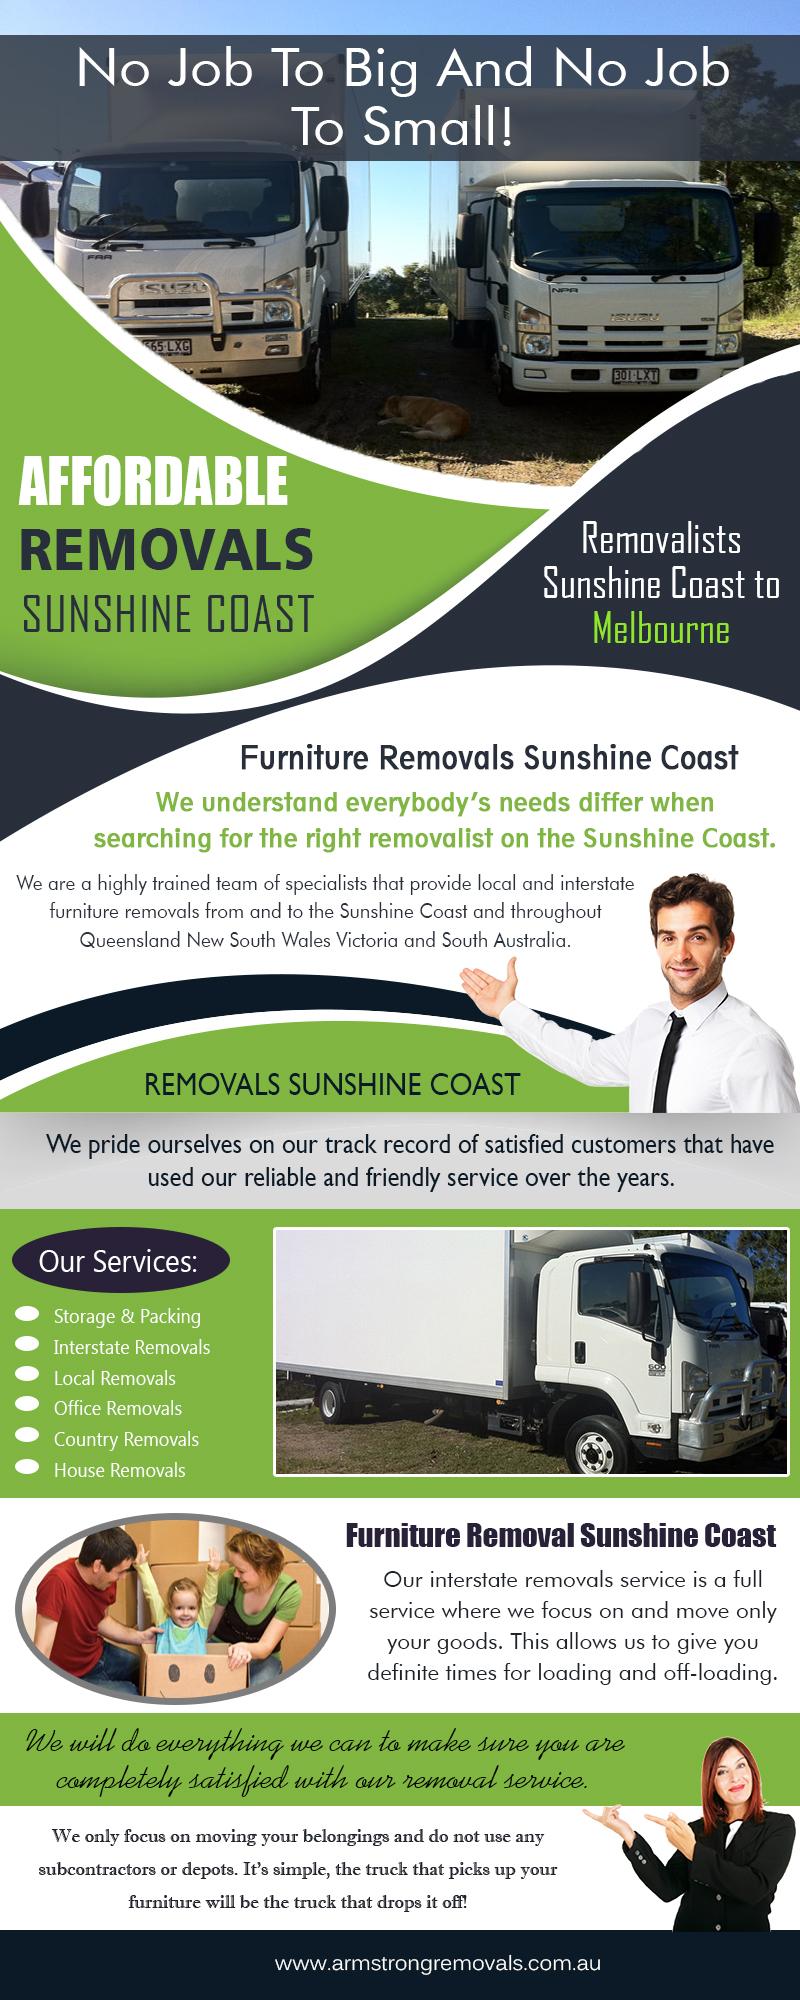 Affordable Removals Sunshine Coast   armstrongremovals.com.au